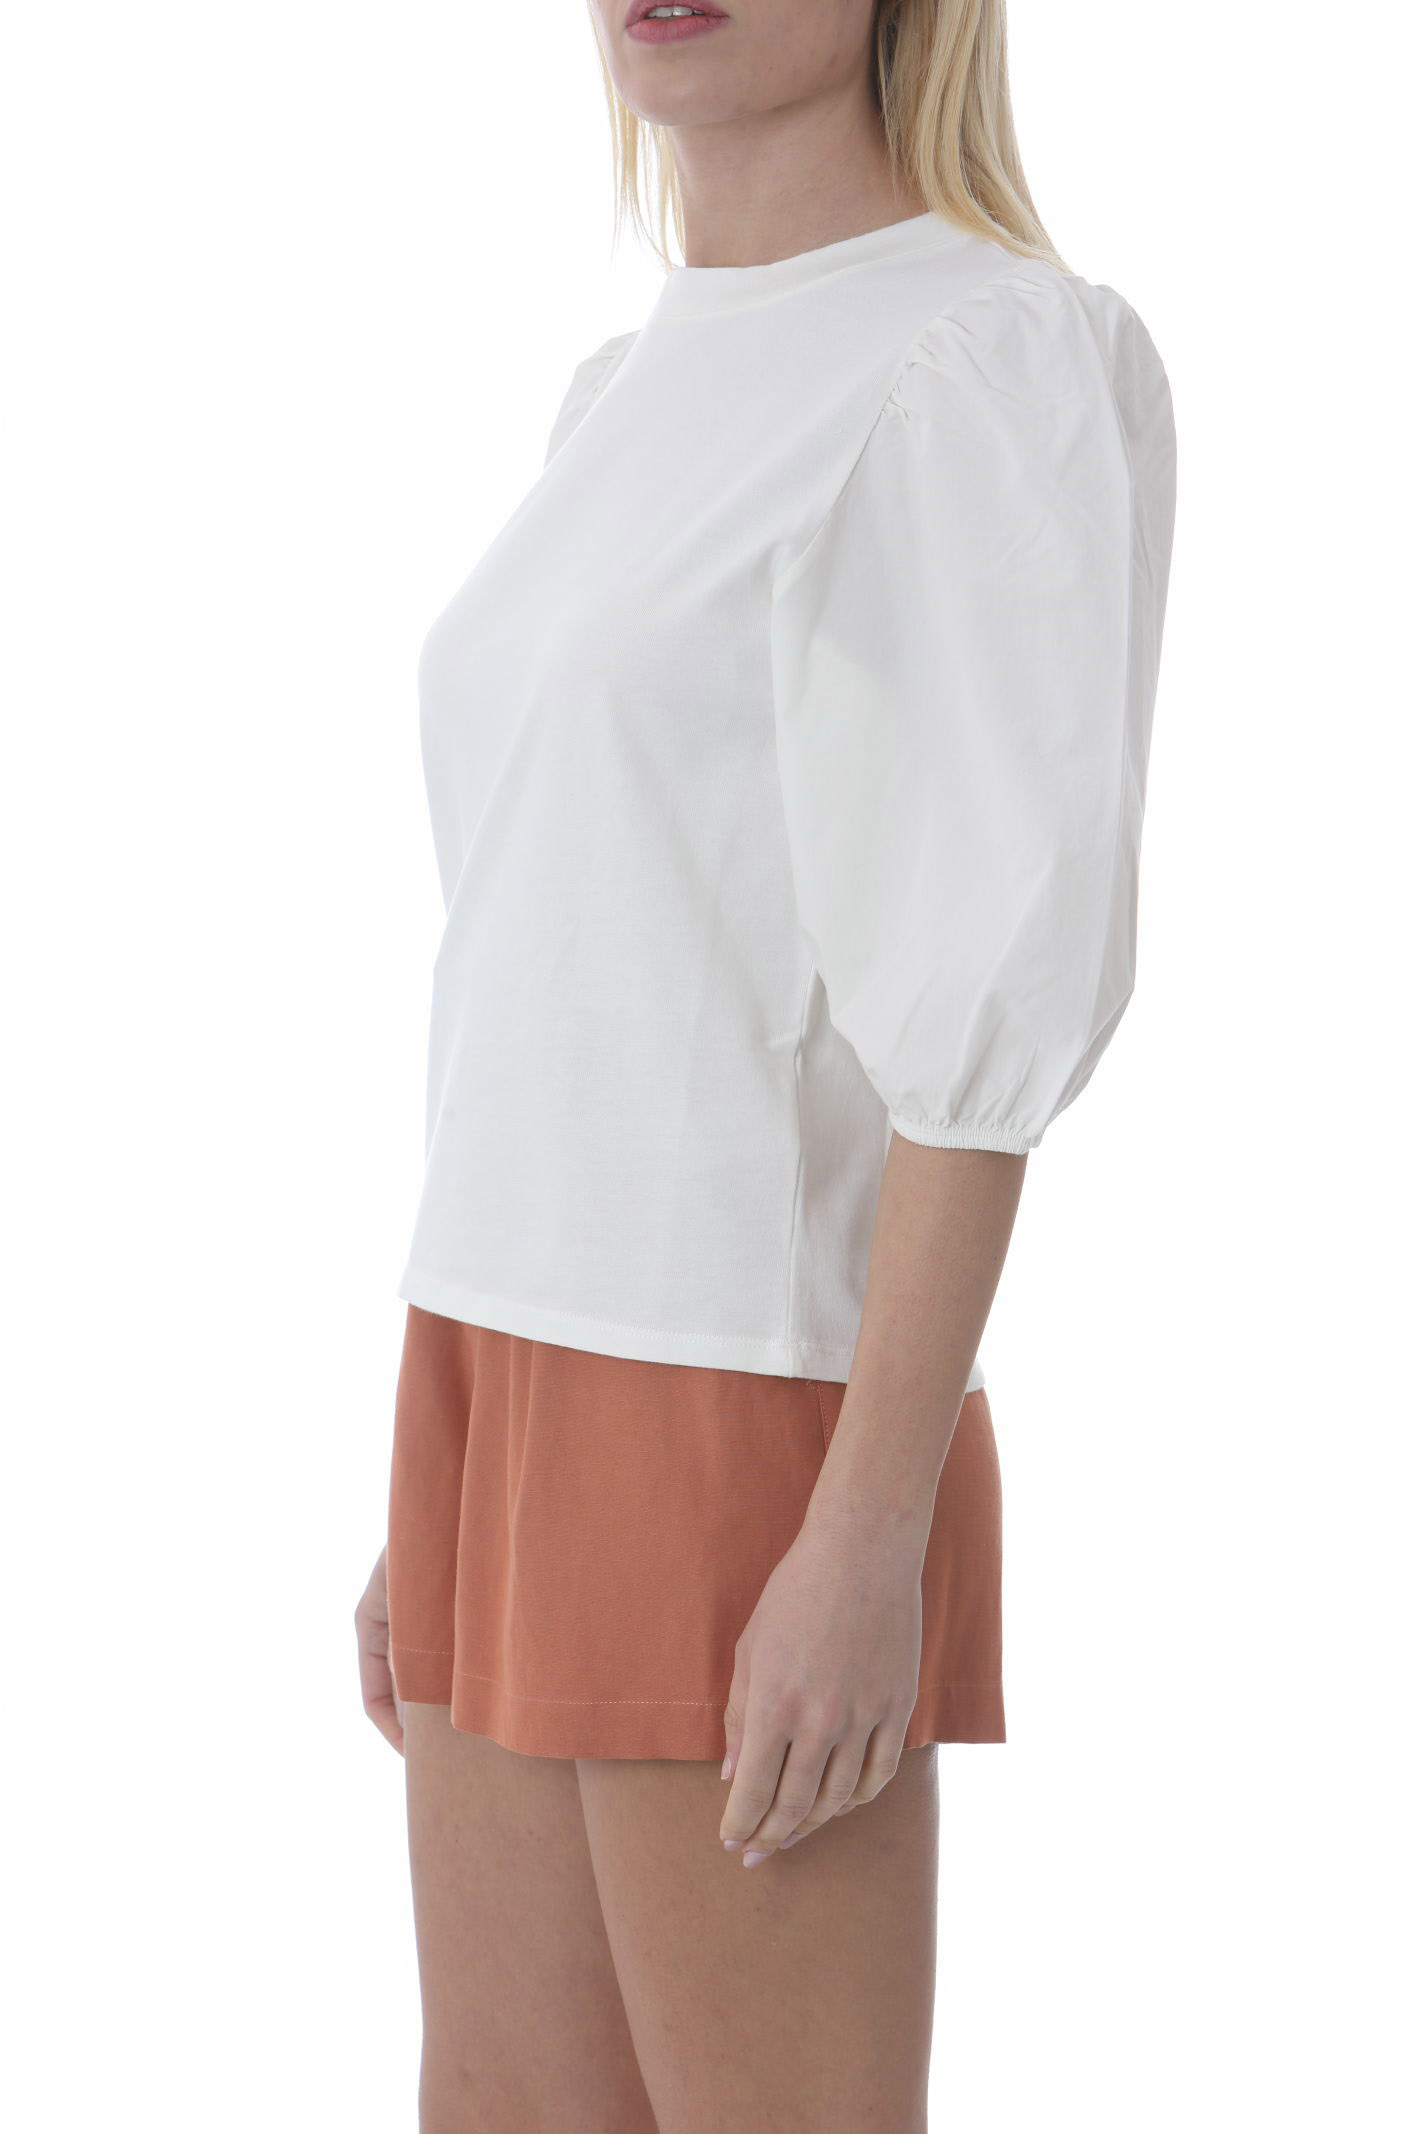 T-shirt donna manche a palloncino ATTIC AND BARN | T- Shirt | ATTS003-AT180200